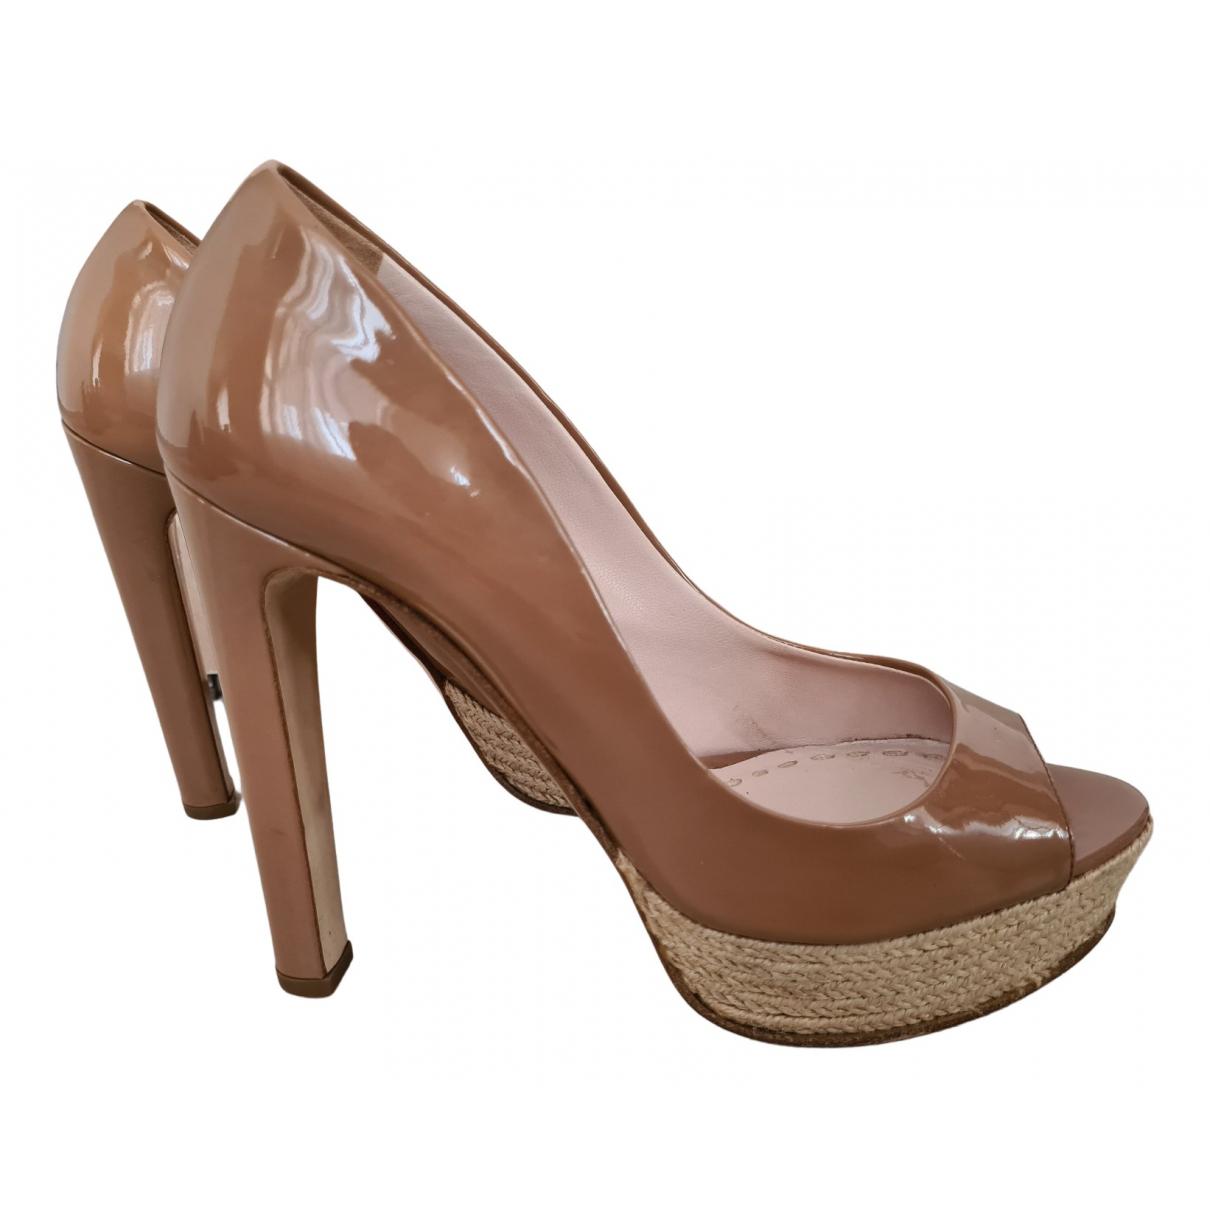 Miu Miu N Brown Patent leather Heels for Women 38 EU